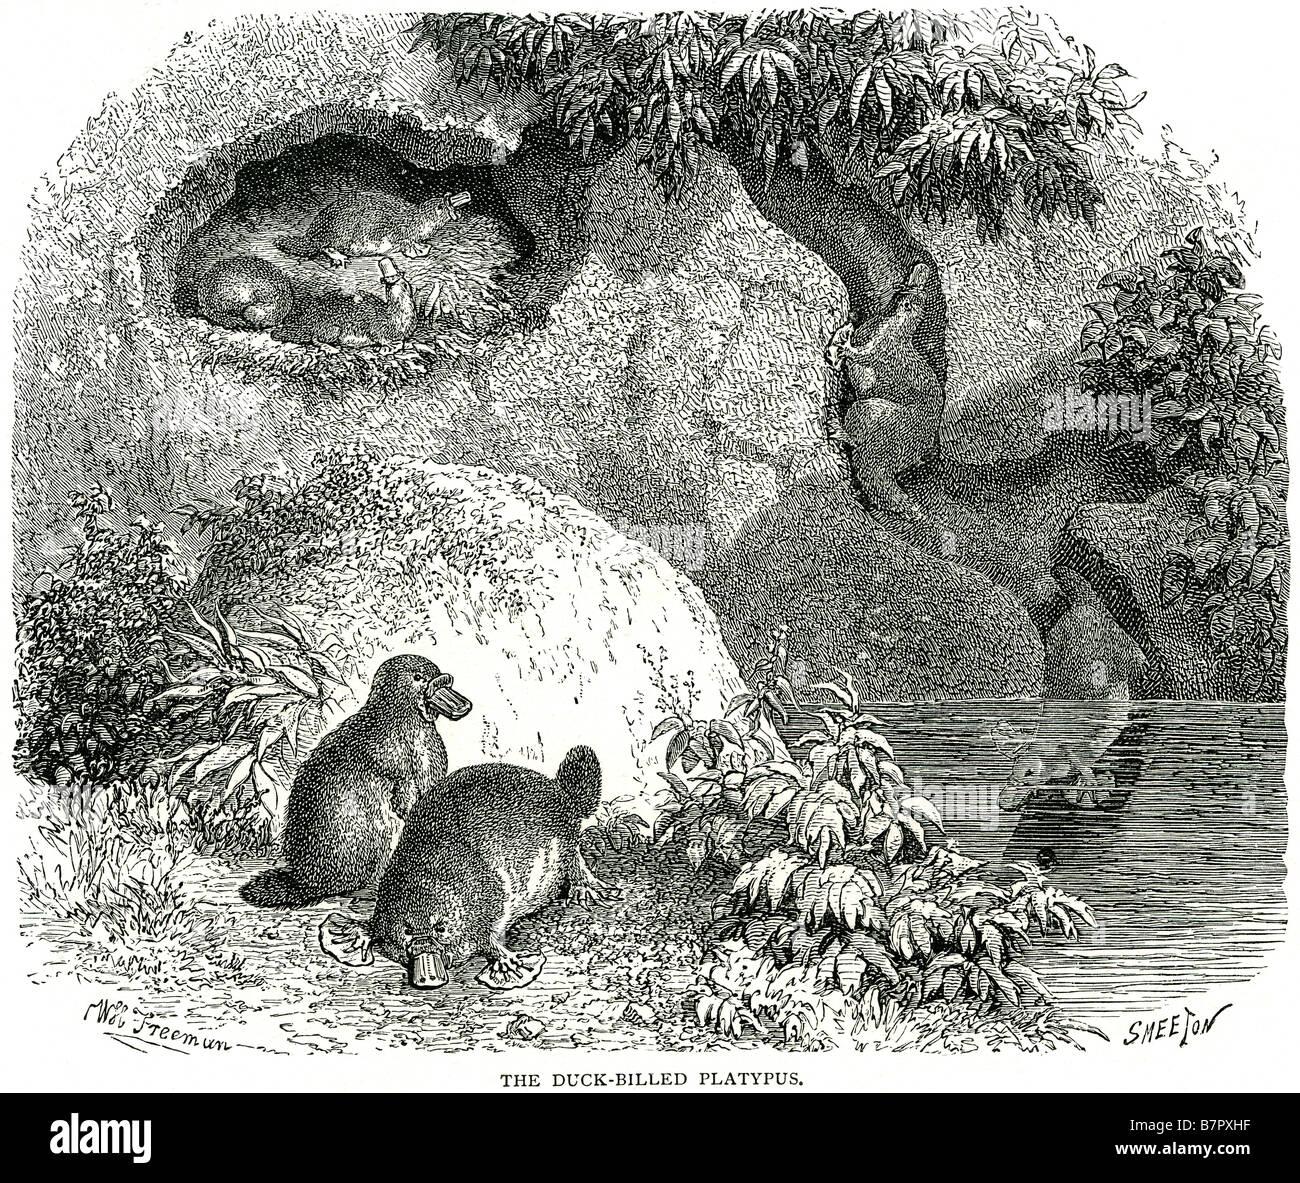 Platypus burrow diagram